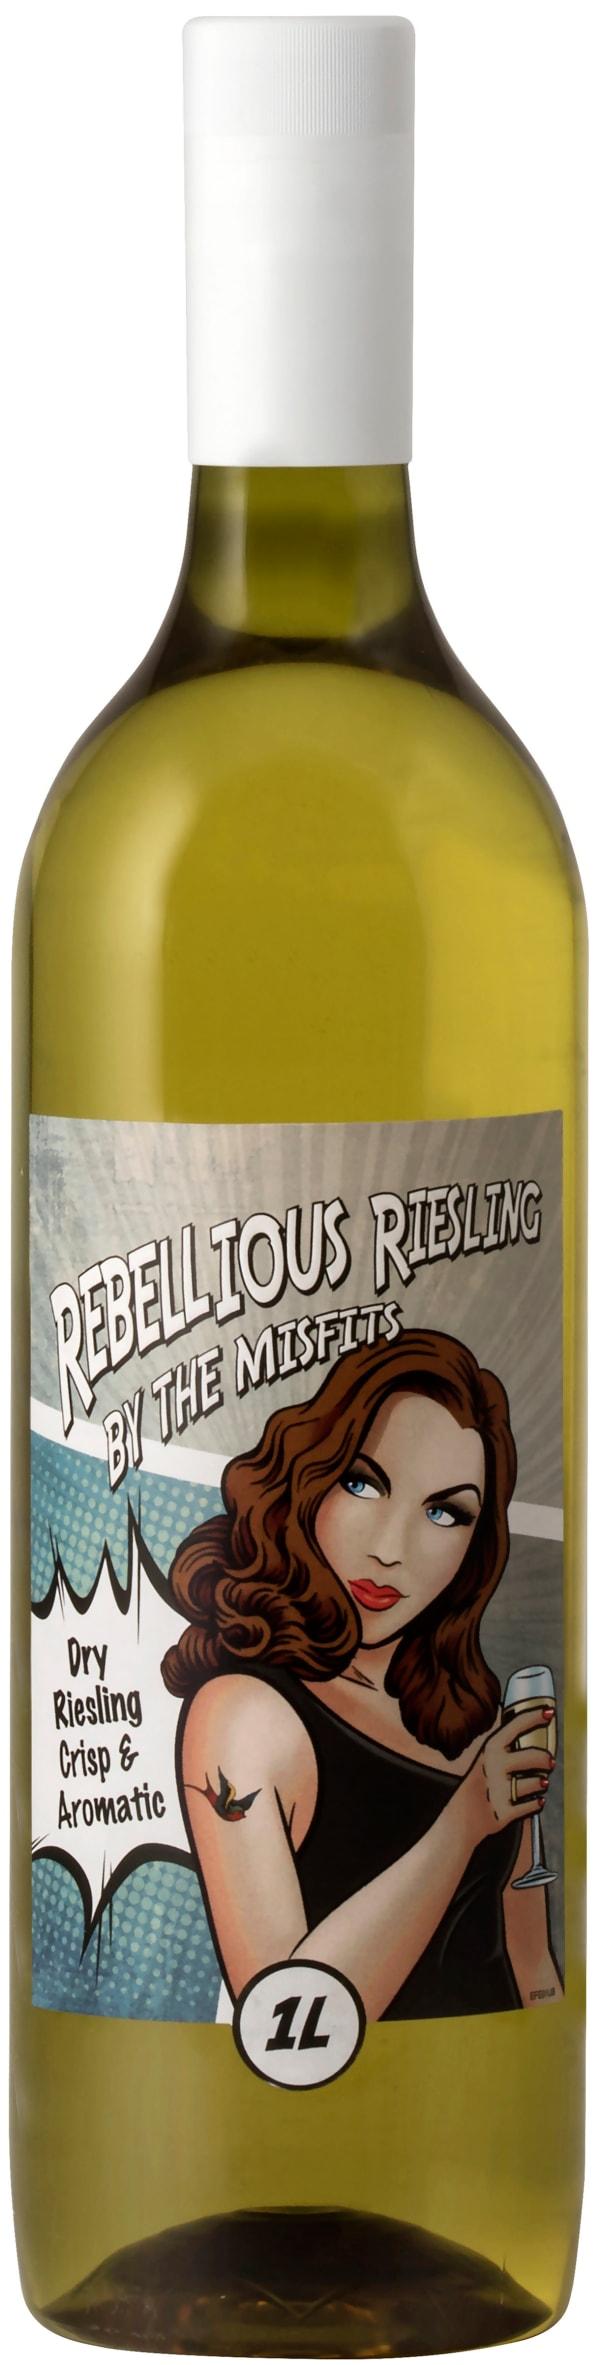 Rebellious Riesling  2019 plastic bottle